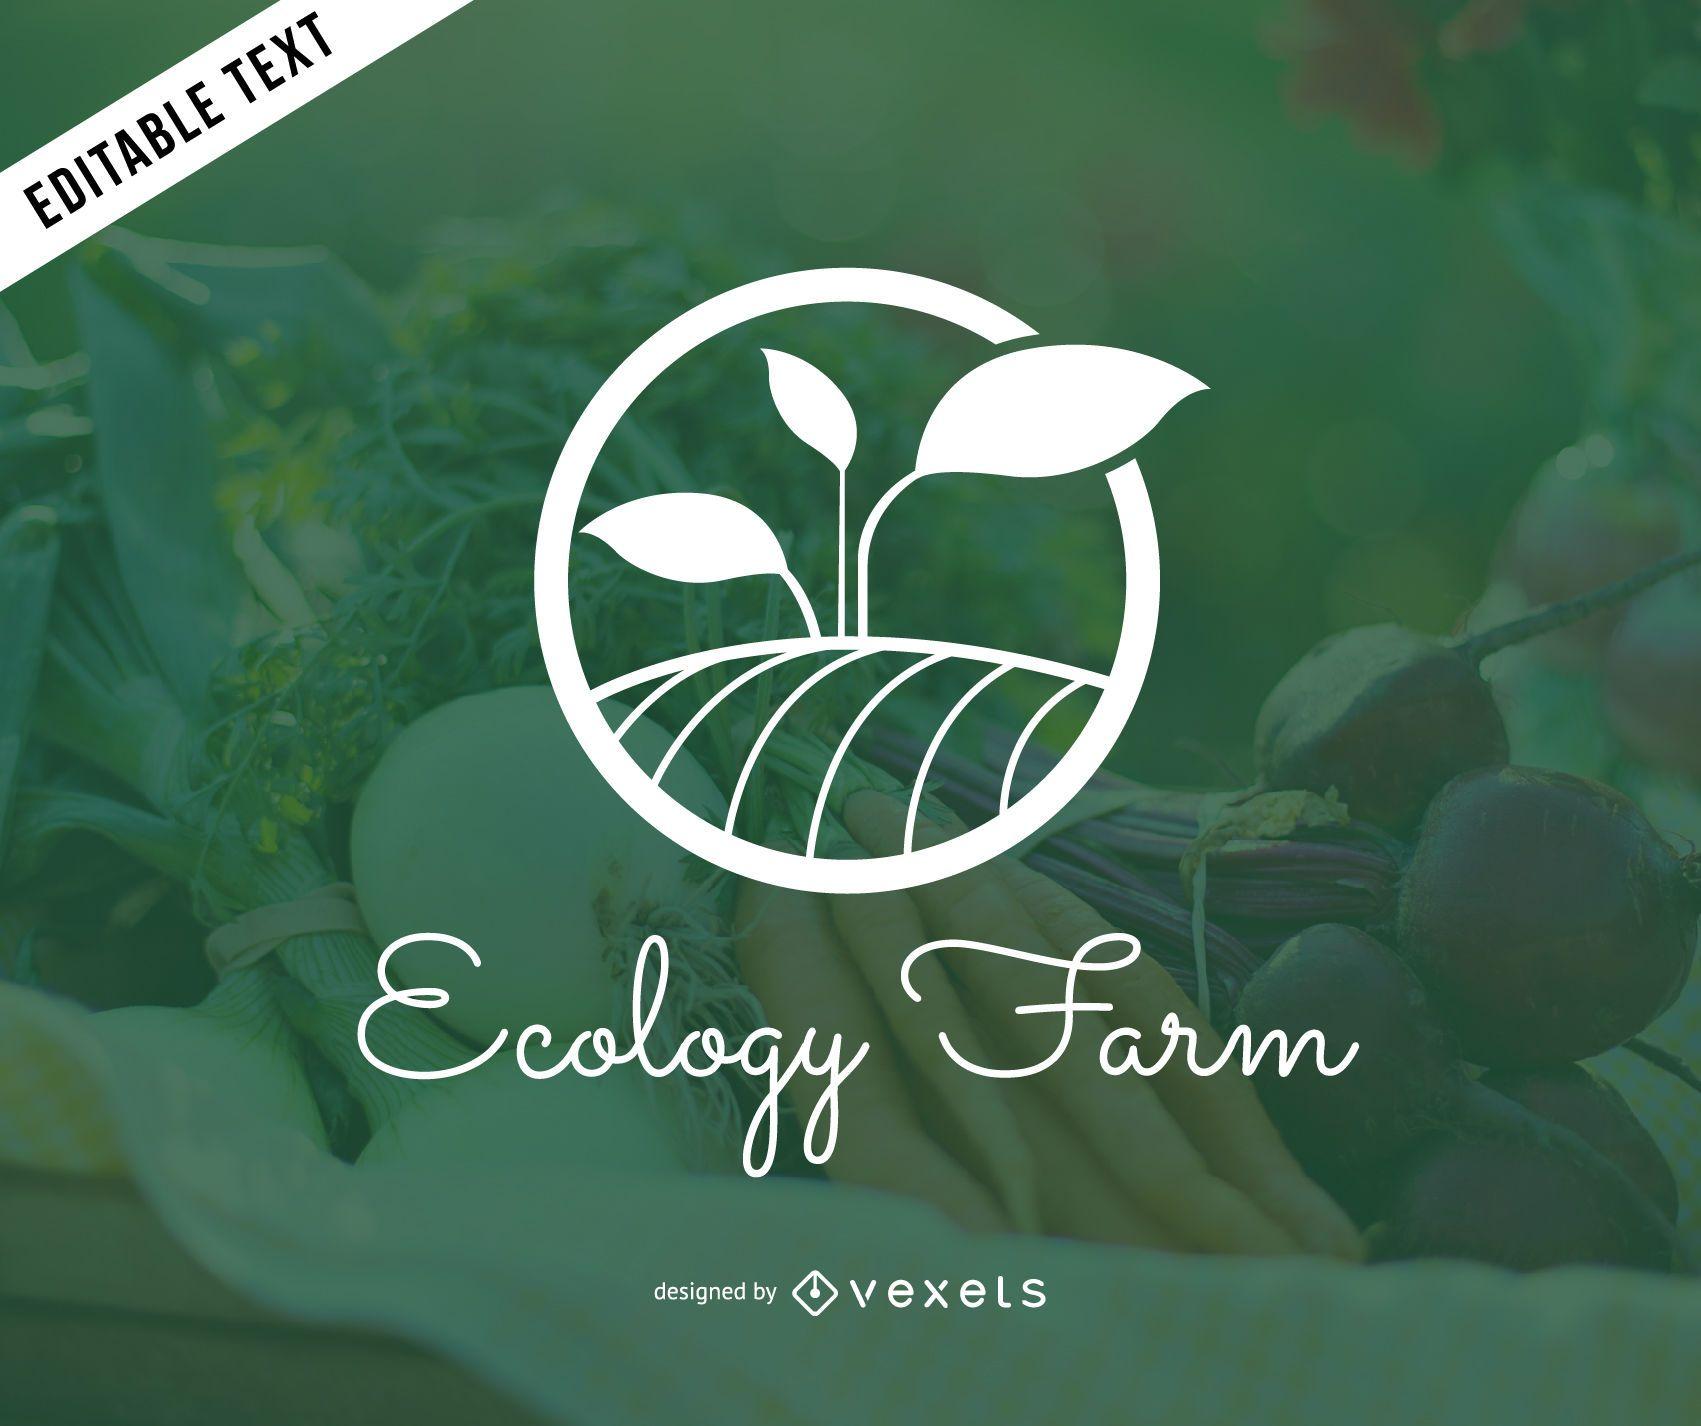 Ecology Farm green logo template